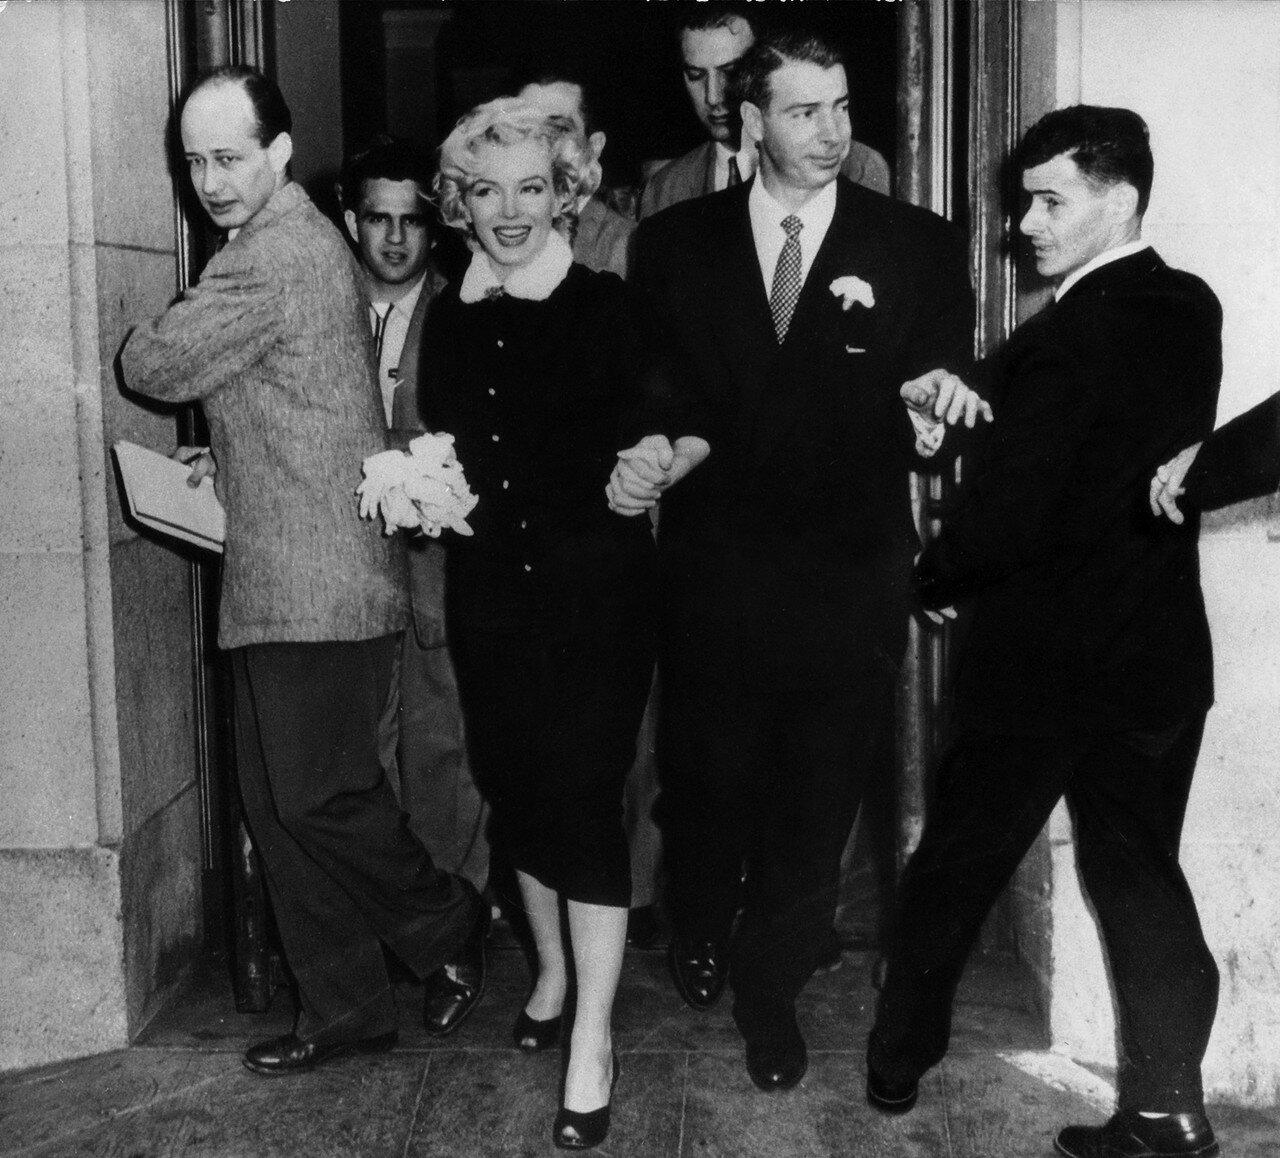 Marilyn Monroe With Joe Dimaggio